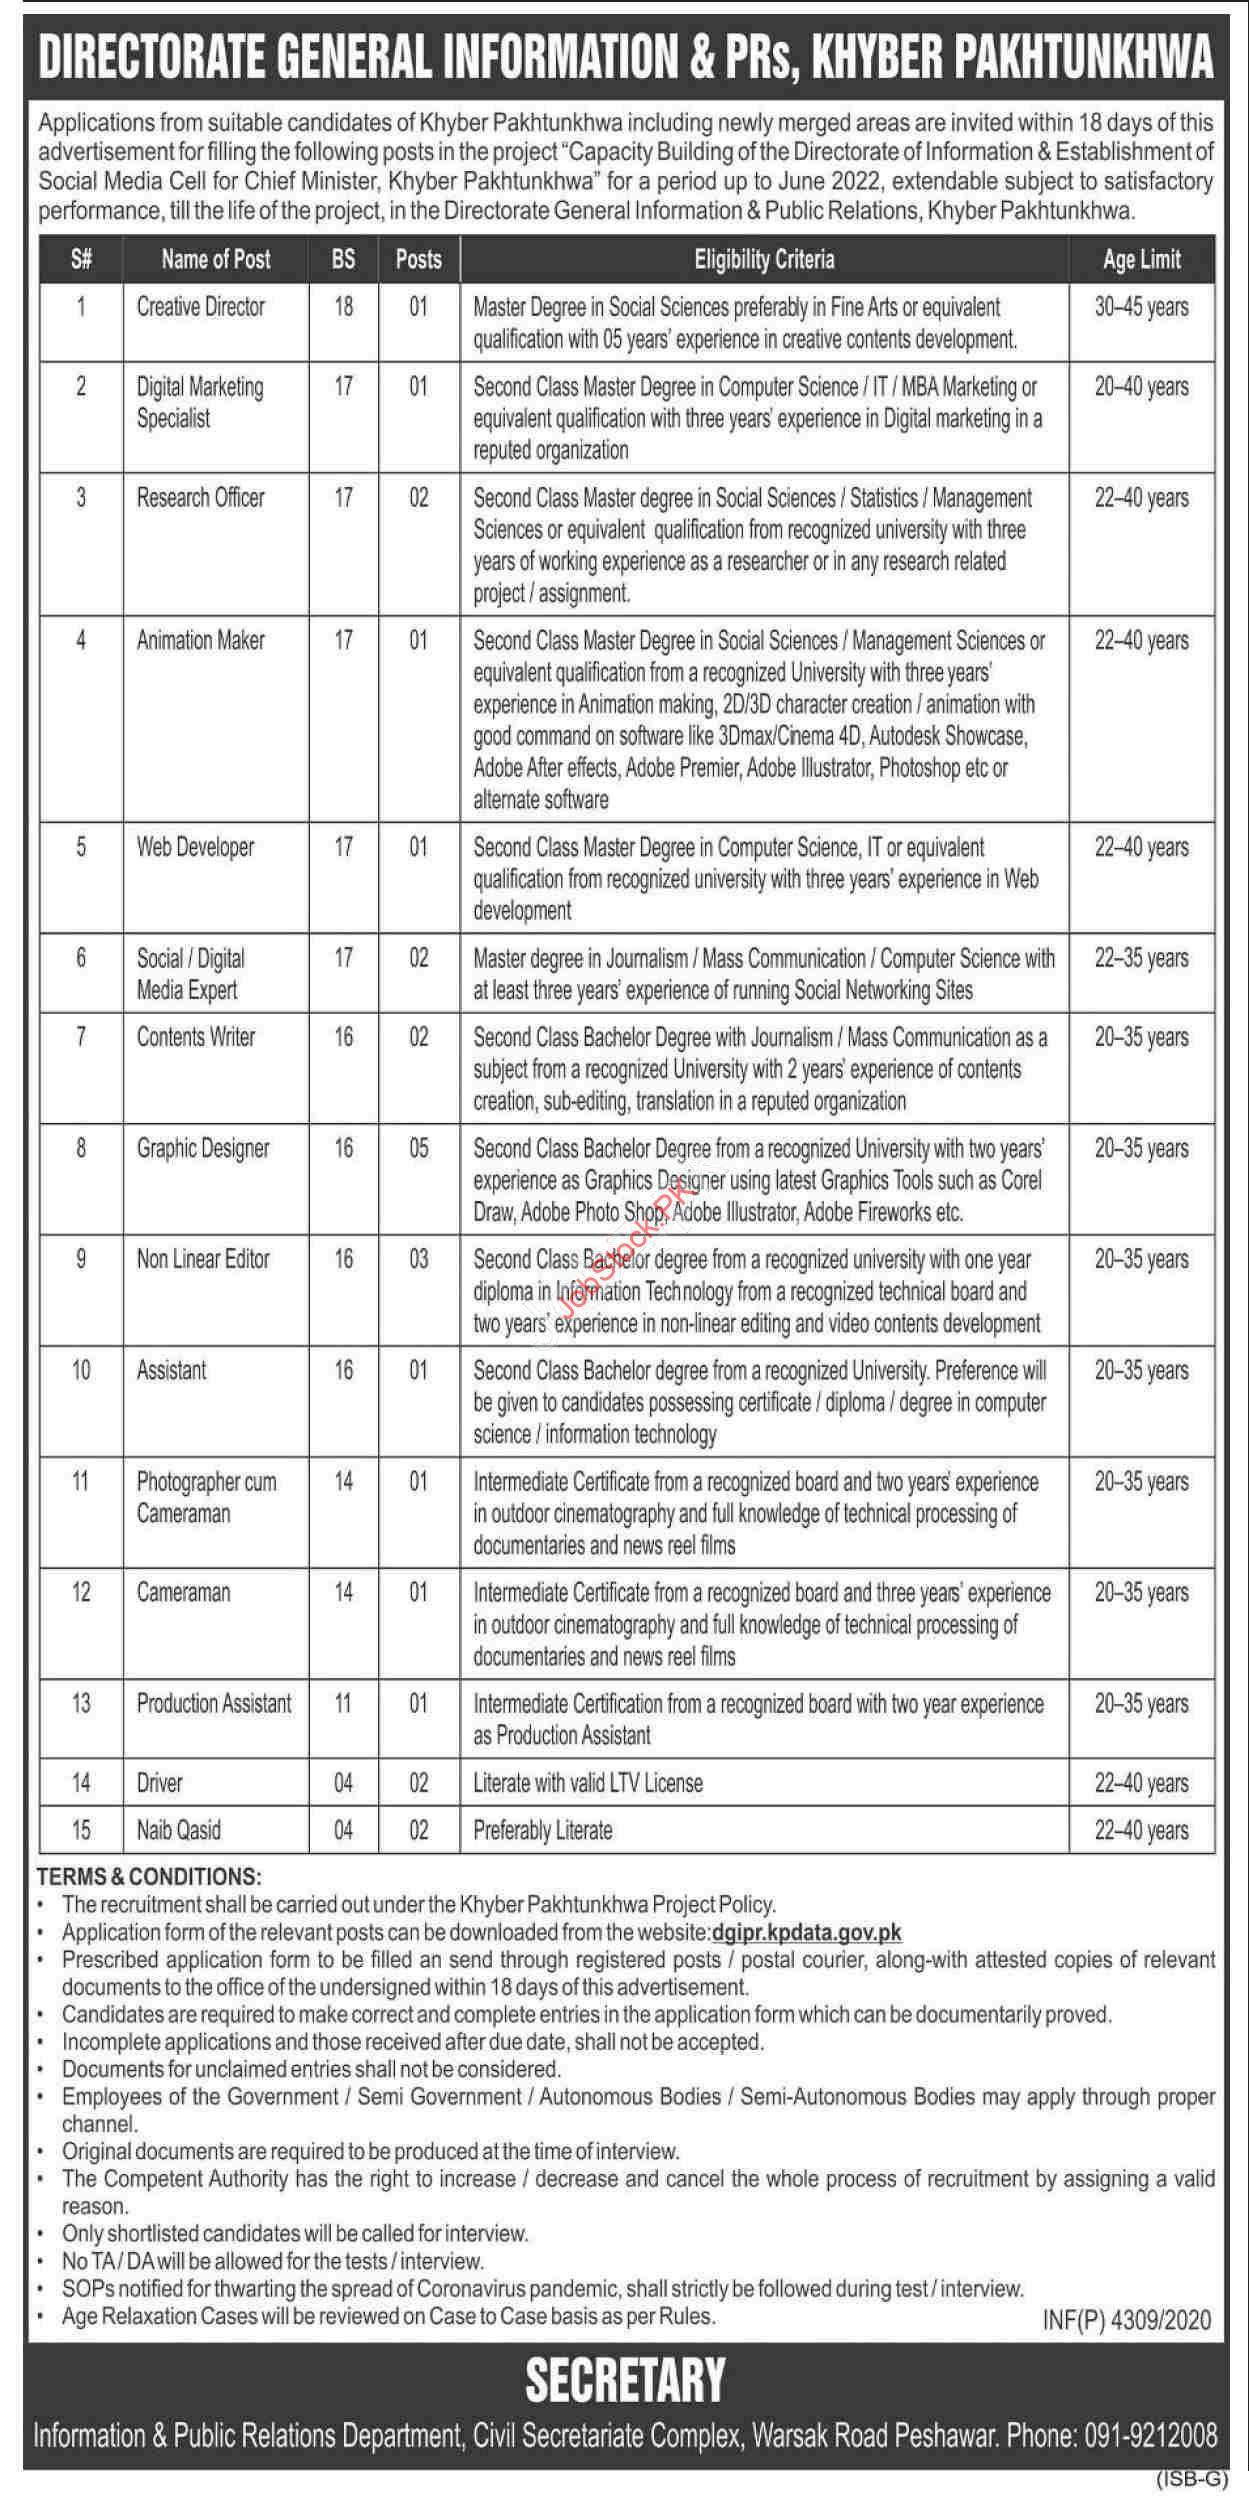 Directorate General Information & Prs Peshawar Jobs 2020 November Latest